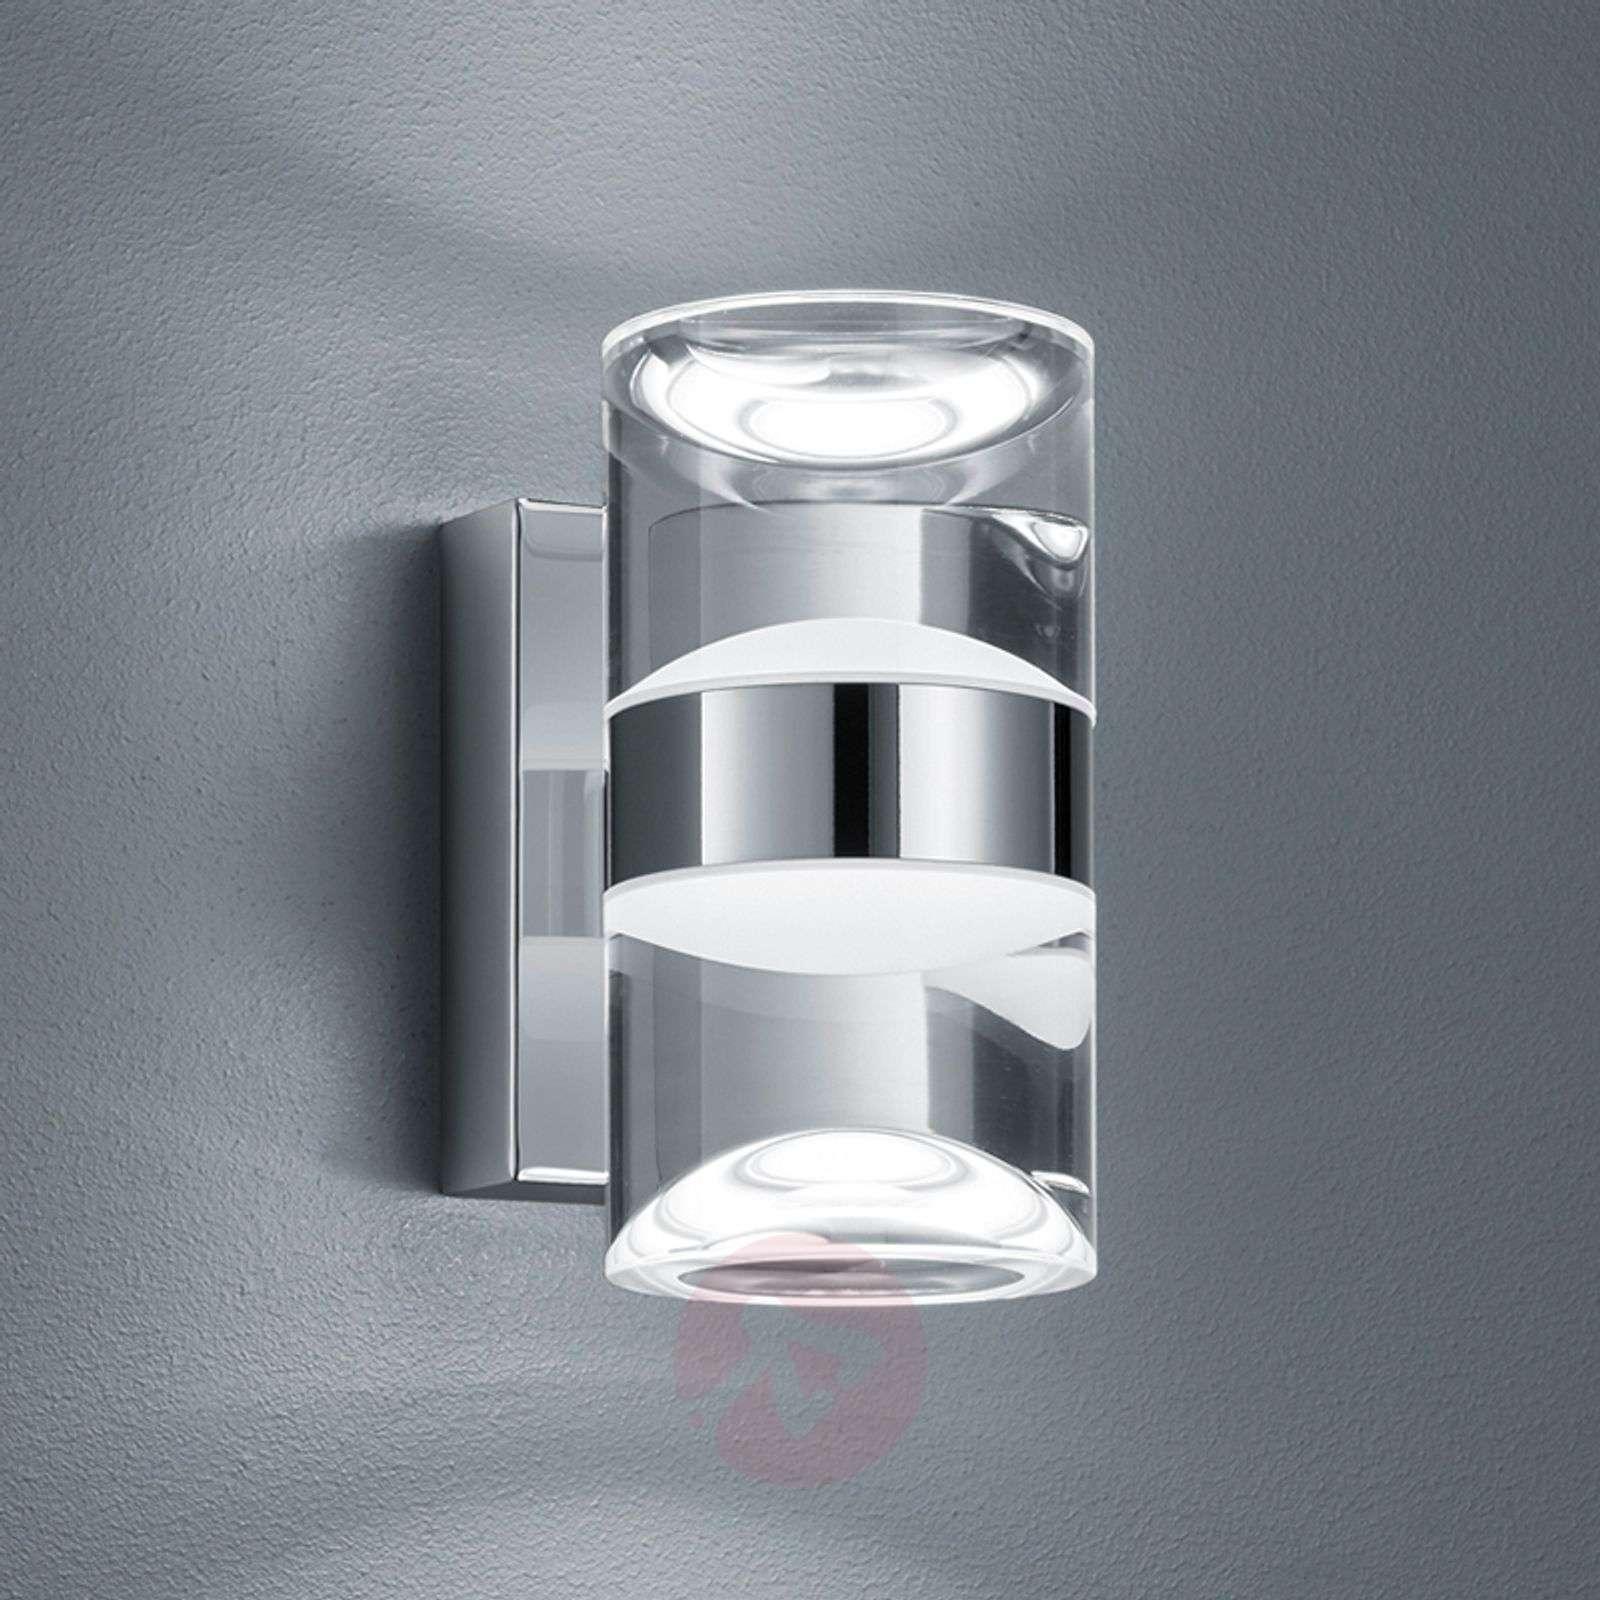 LED bathroom wall lamp Brian shining up and down-9005211-02